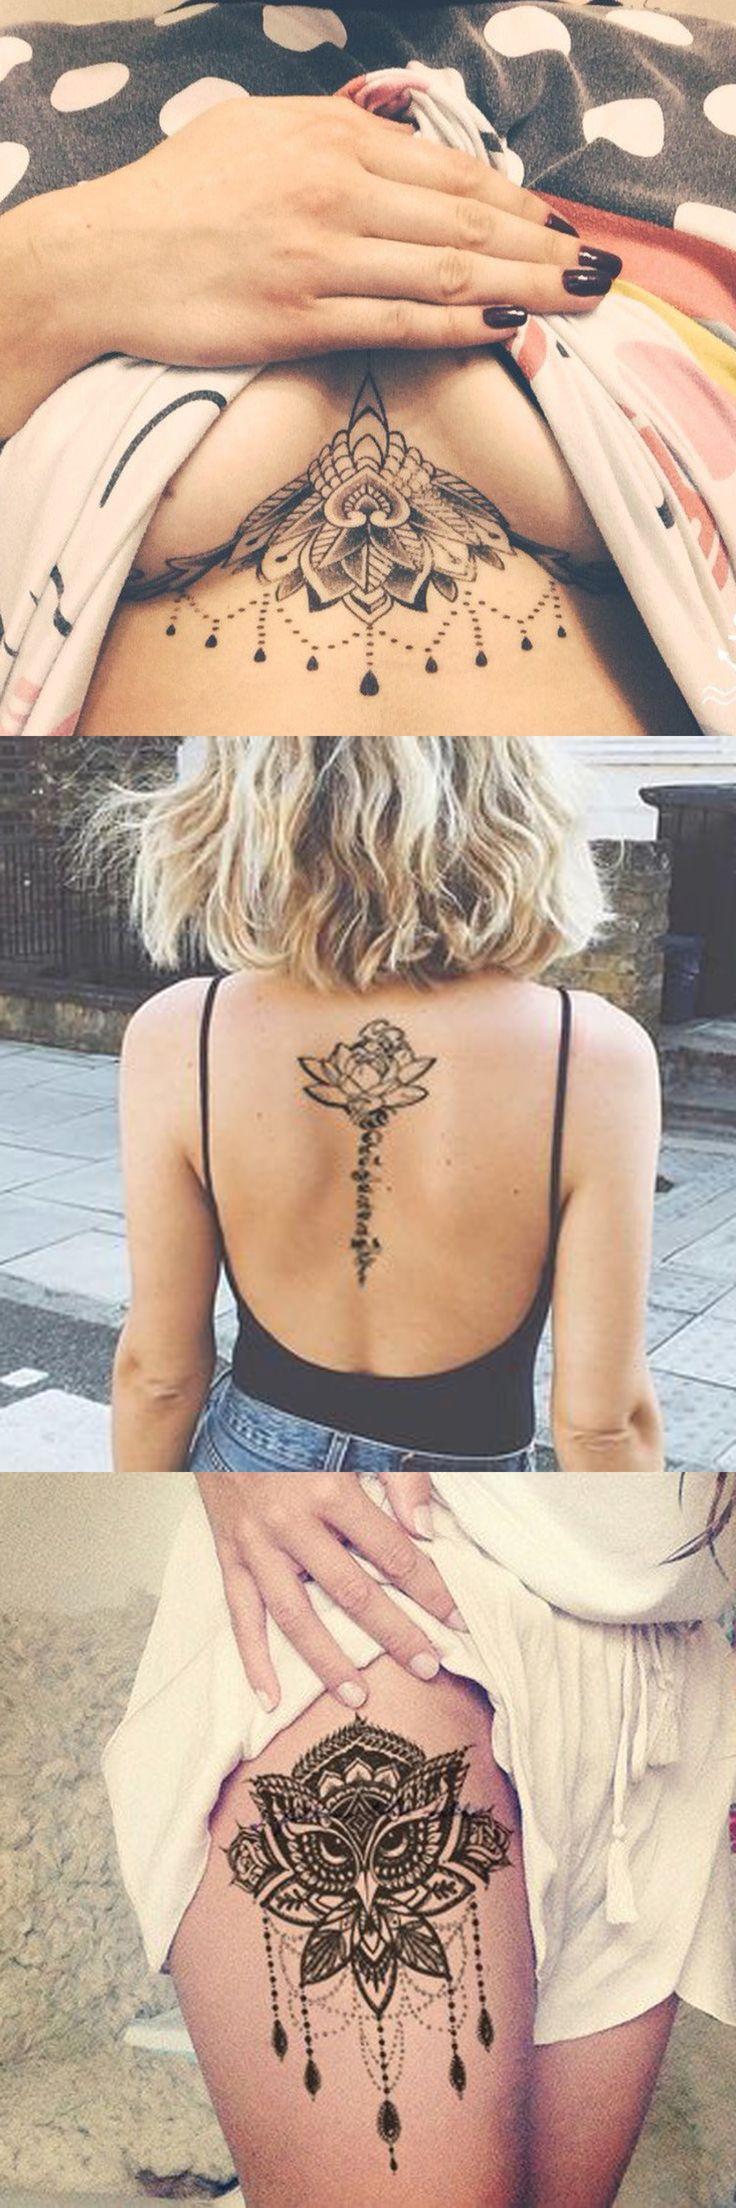 Lotus Tattoo Ideas for Women - at MyBodiArt.com - Flower Script Spine Temporary Tattoos - Sternum Chandelier Tat - Owl Thigh Upper Hip Leg Tatt